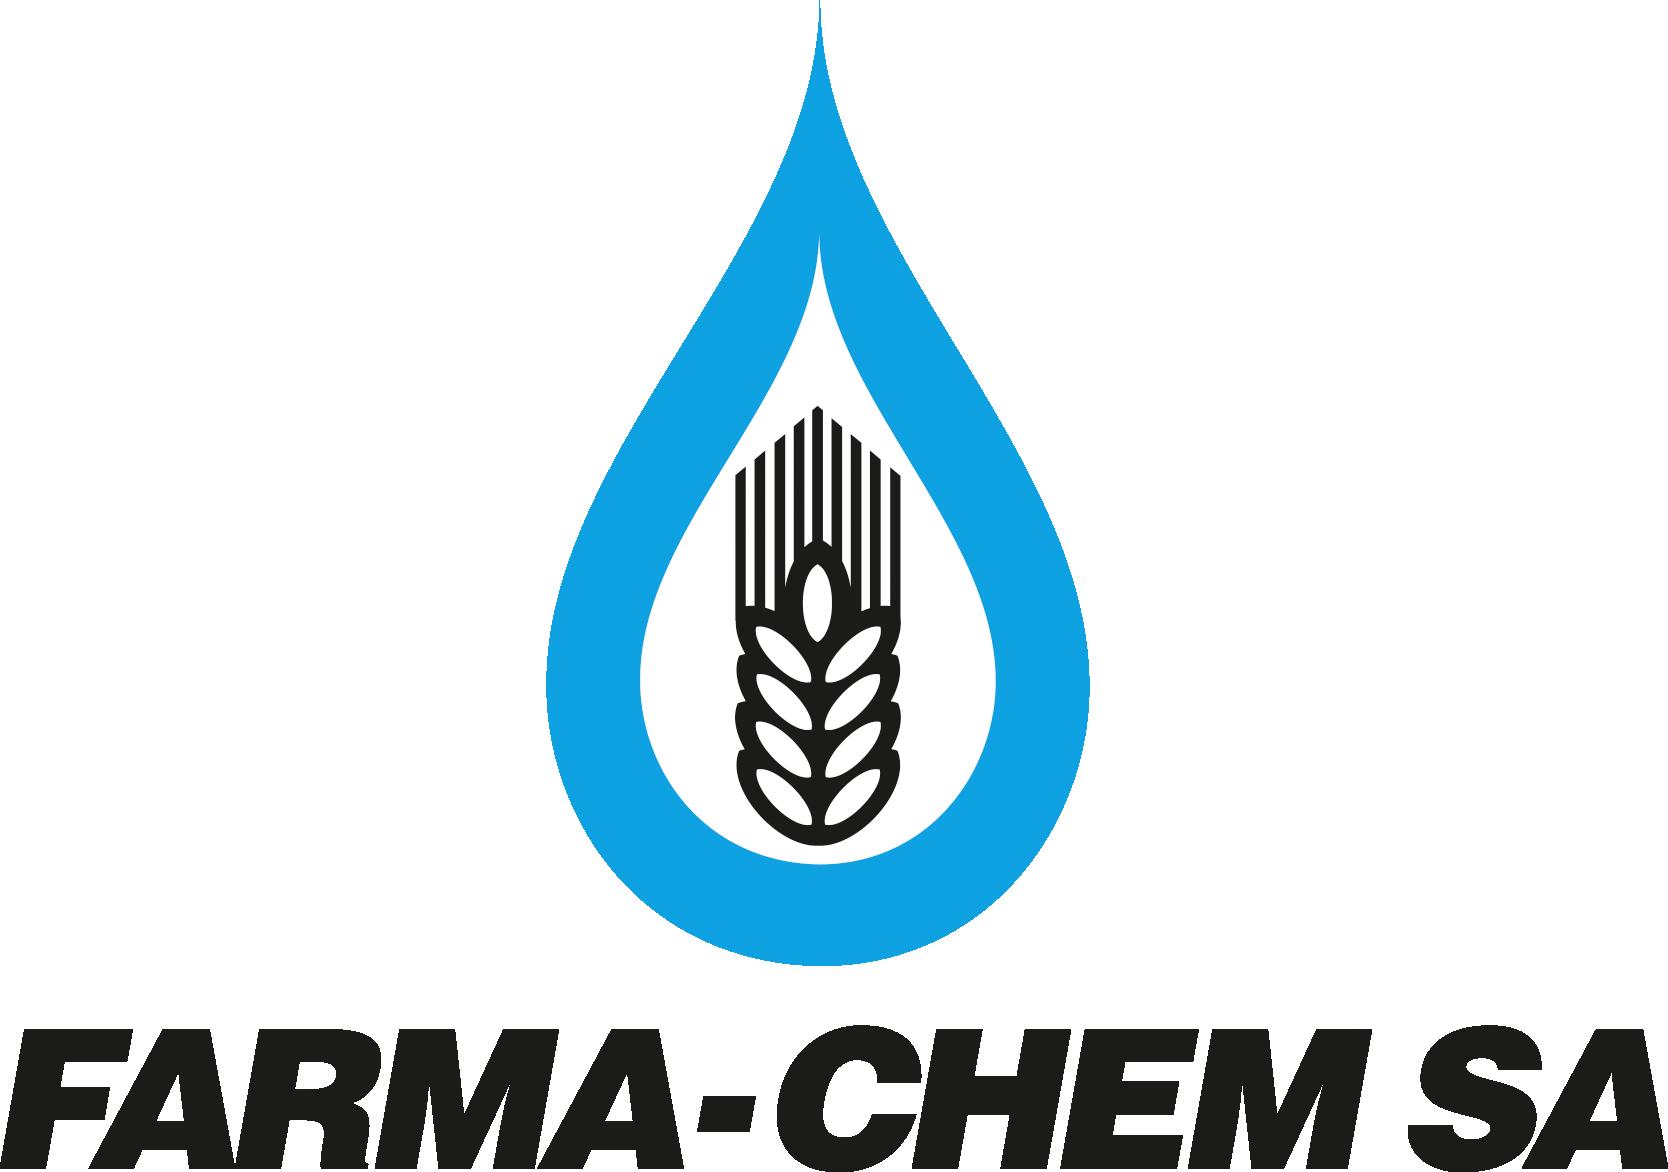 Farmachem RG Logotype